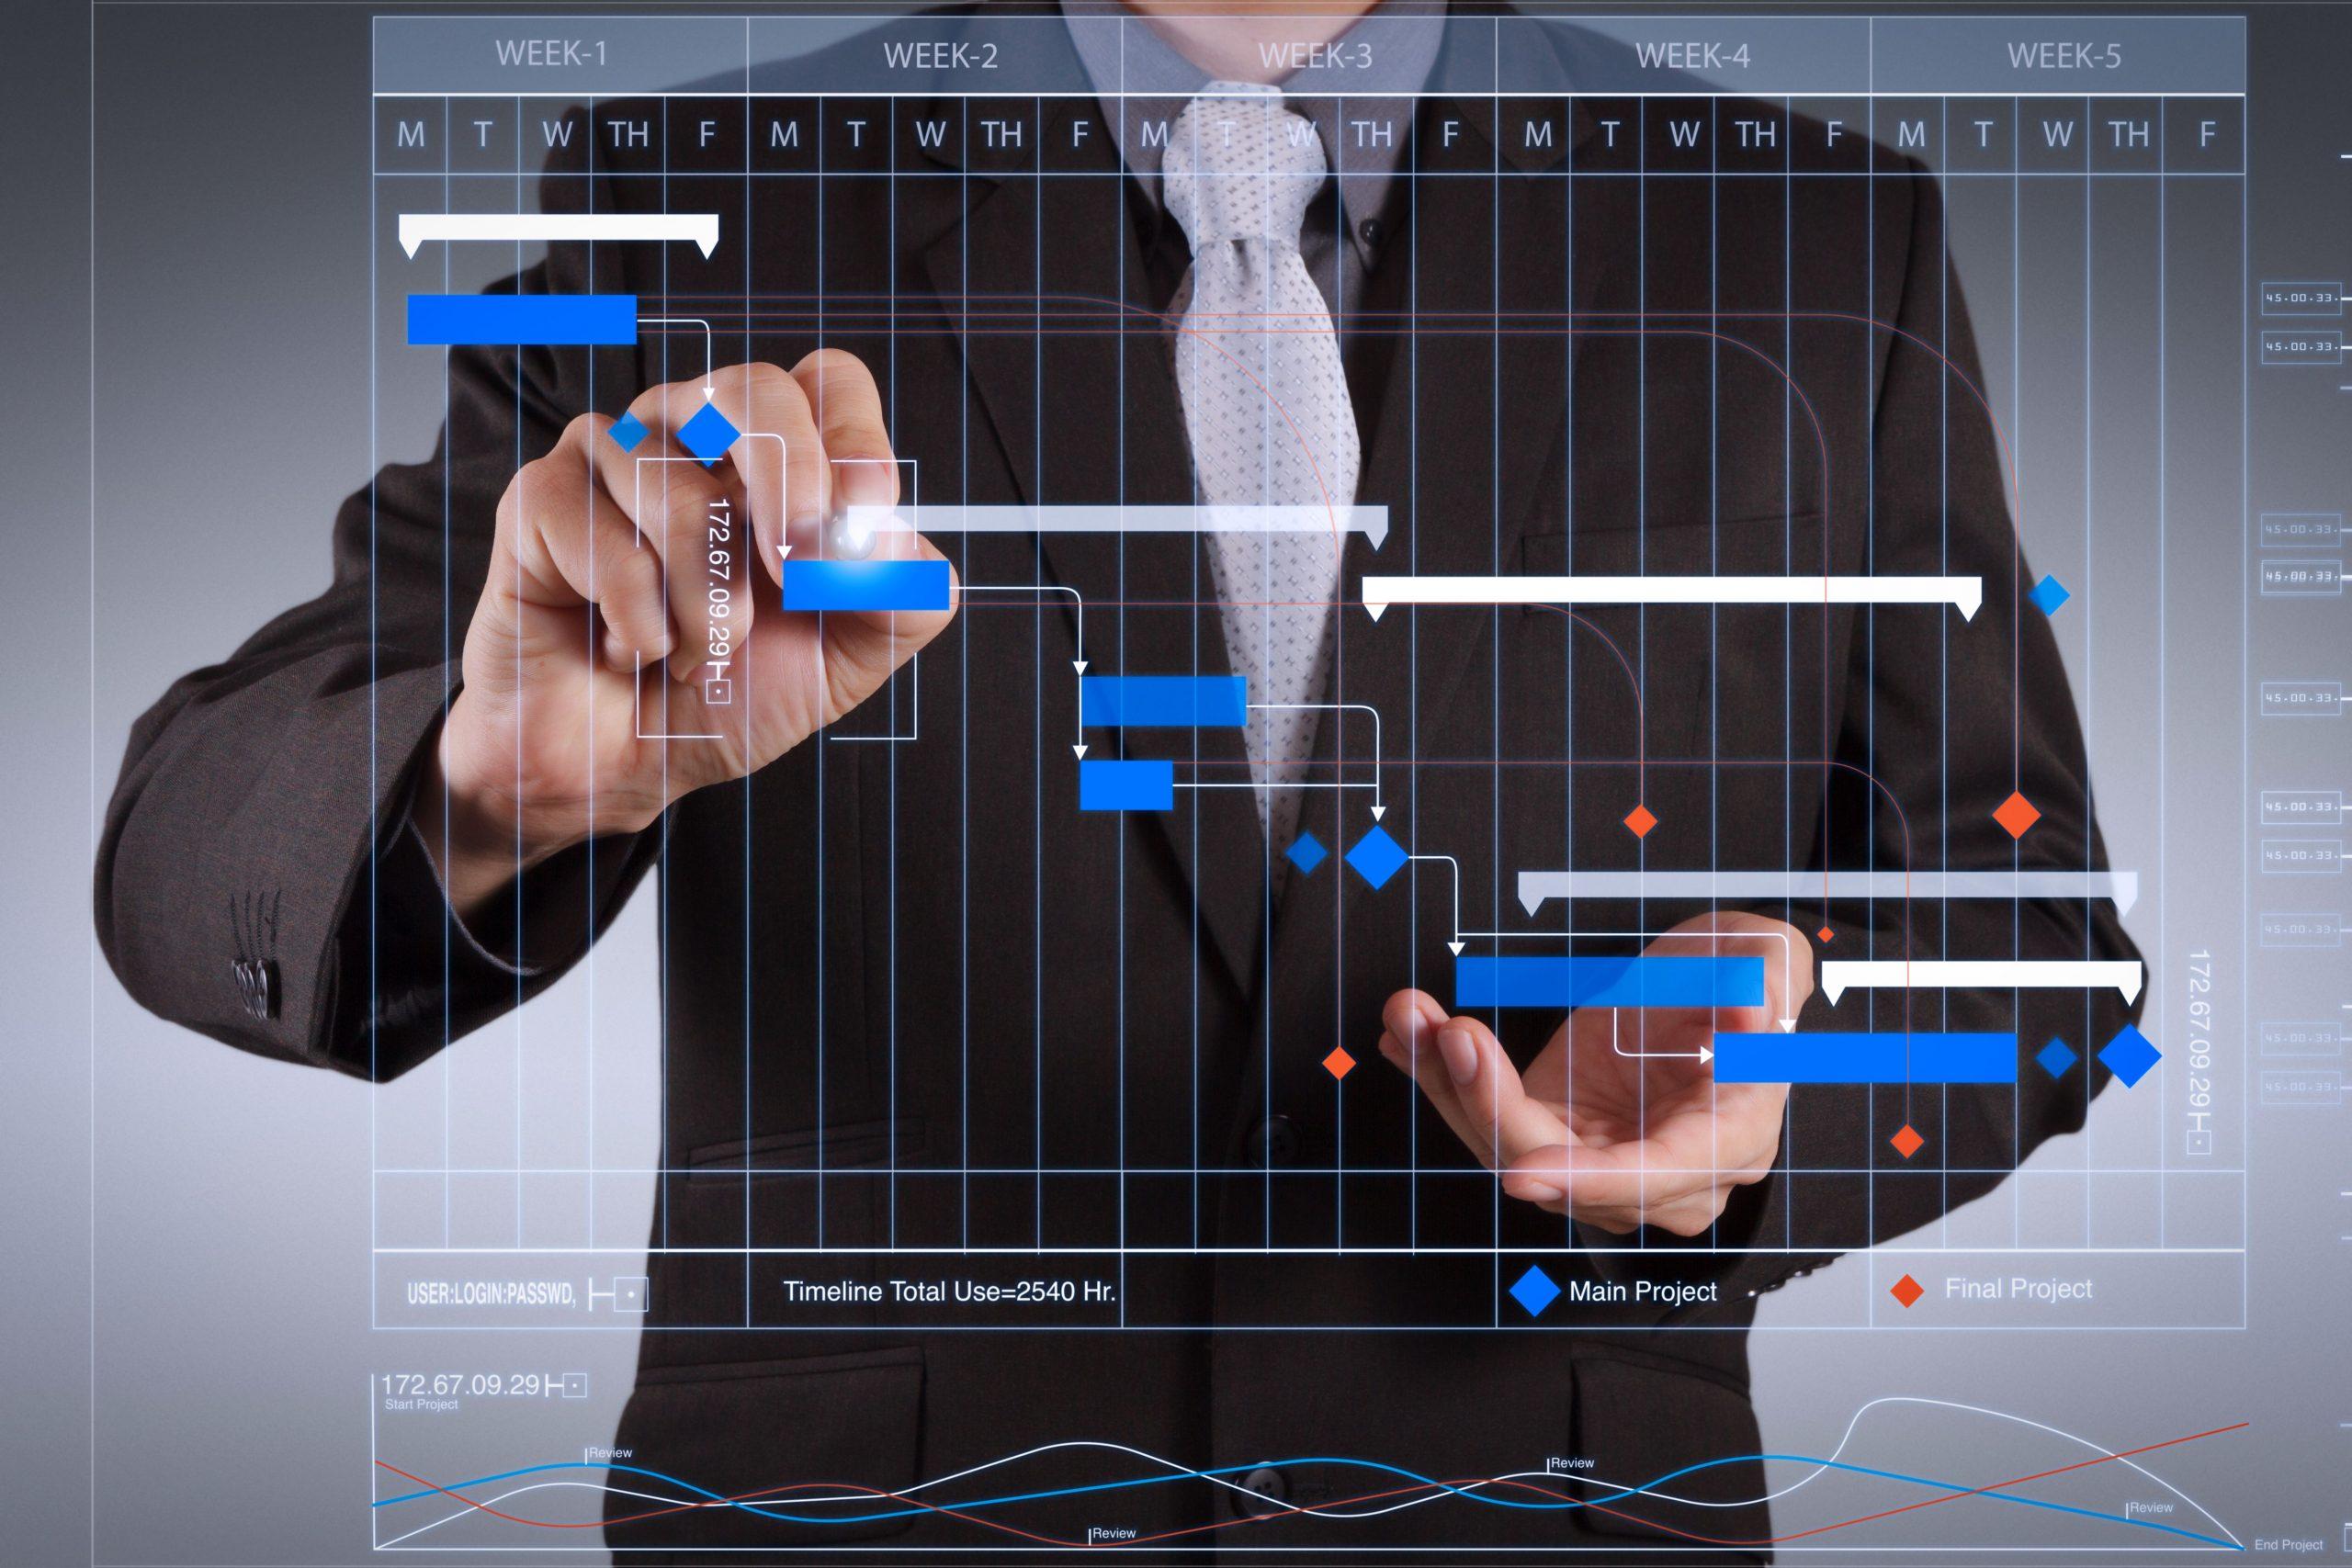 Project Management/Project Server